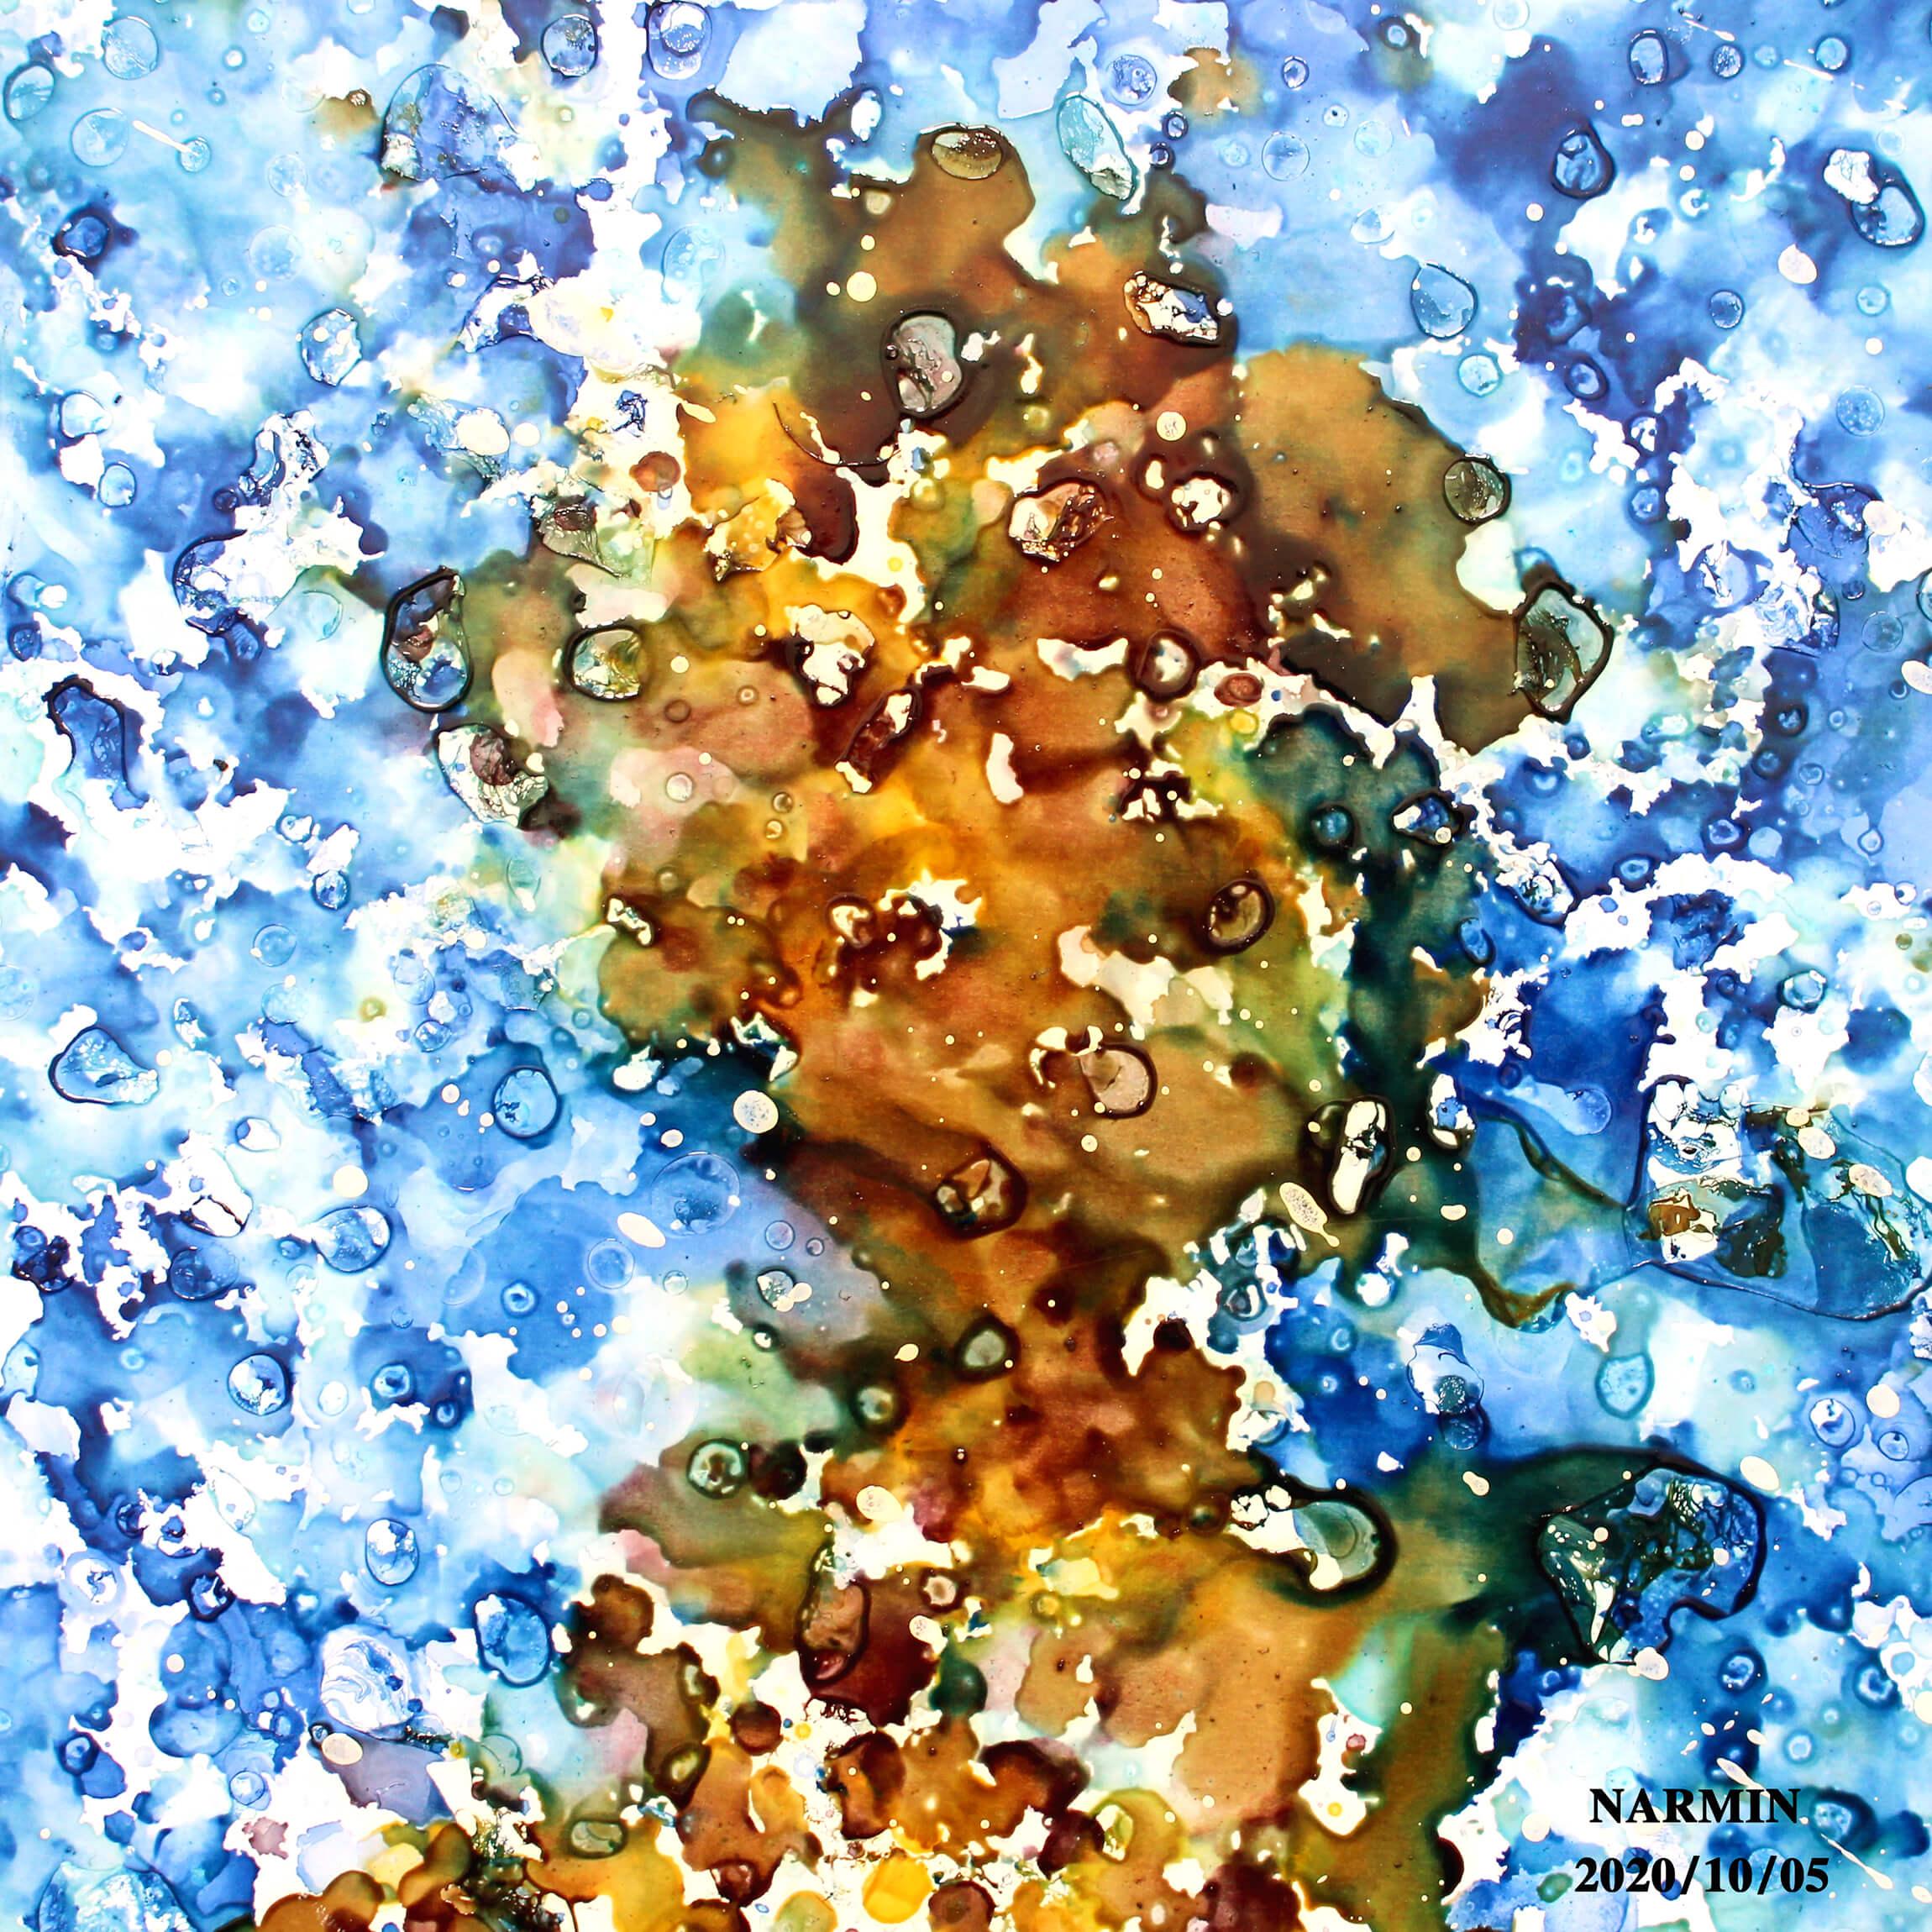 Immersion of the Island in Lake Water by Samira Ashari